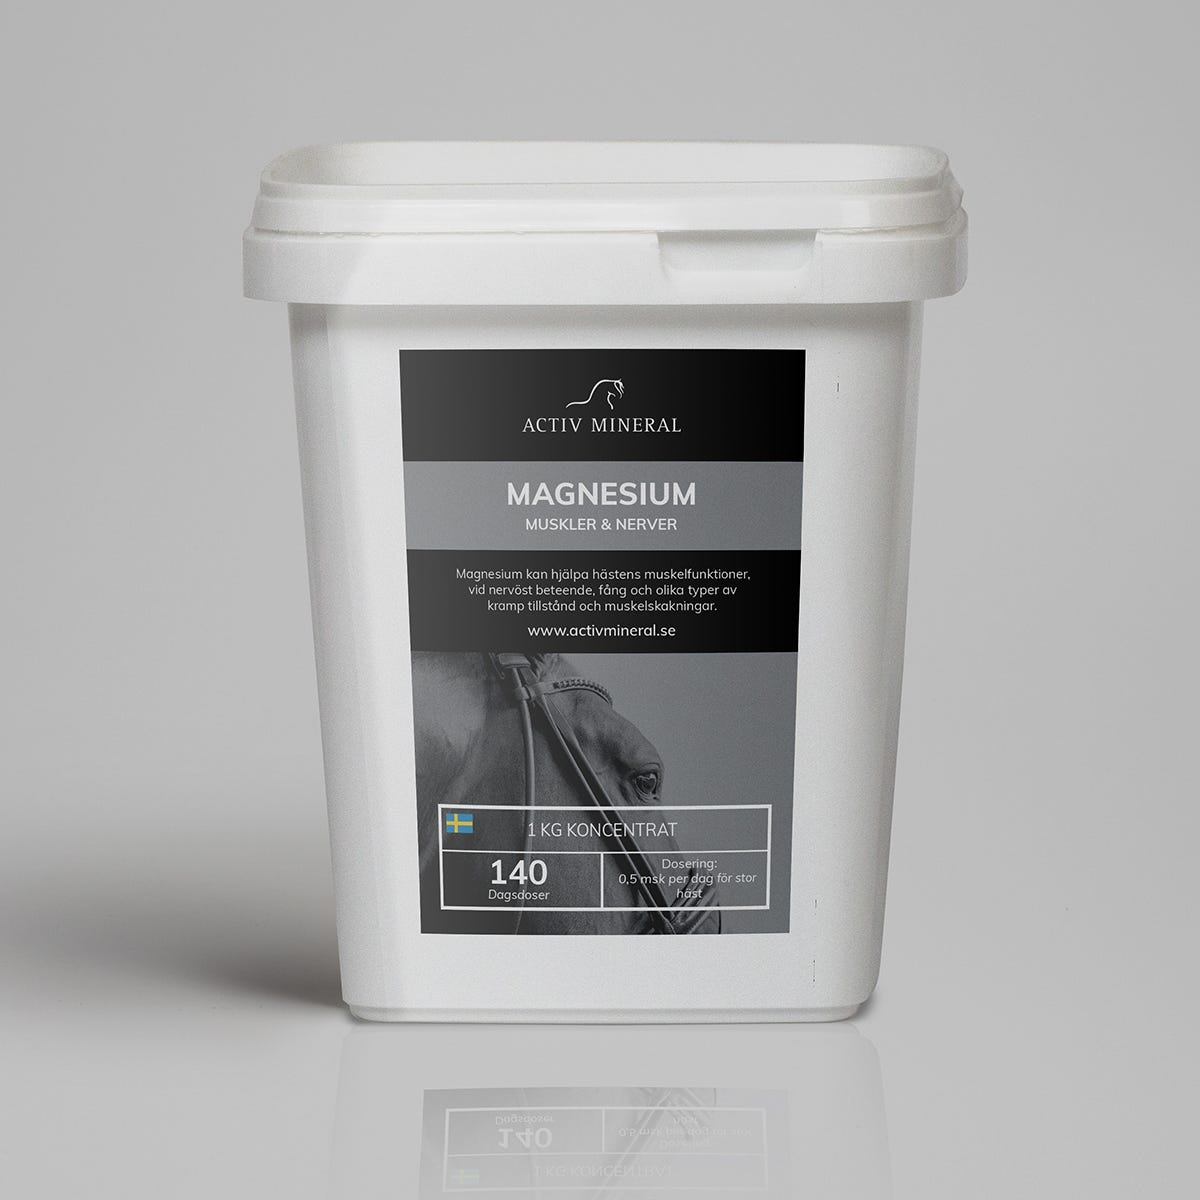 Hästmineral Activ Mineral Magnesium 1 kg - Activ Mineral